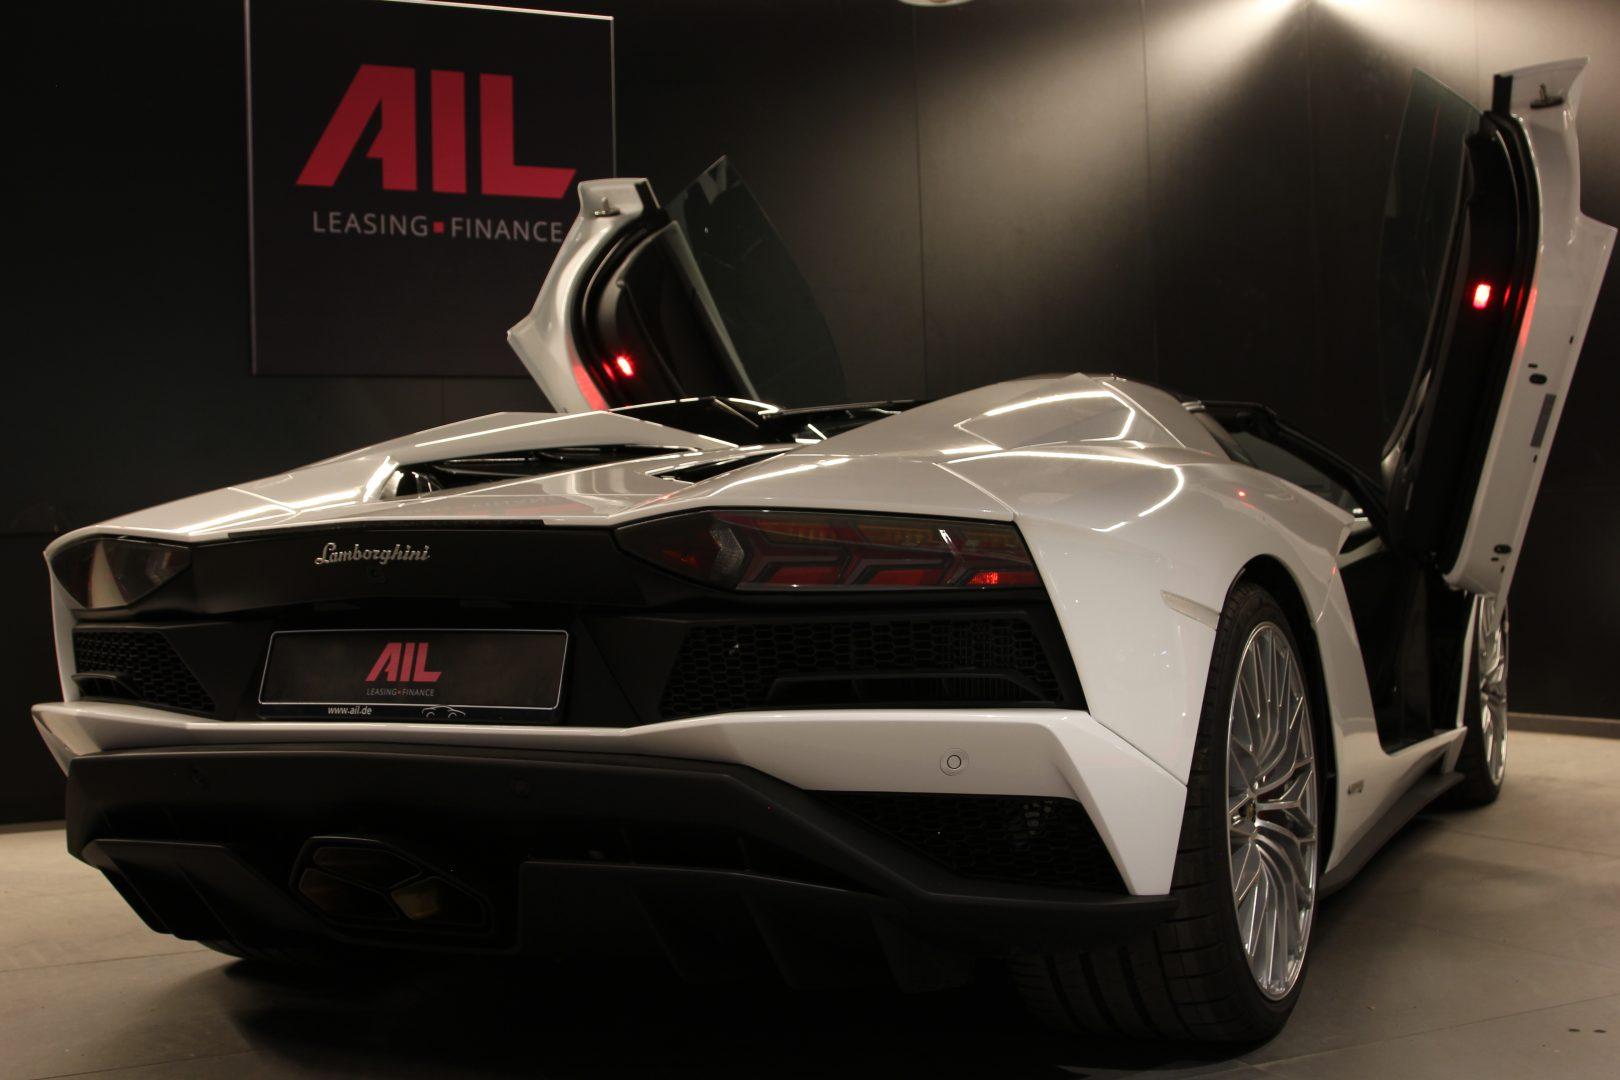 AIL Lamborghini Aventador S Roadster 5